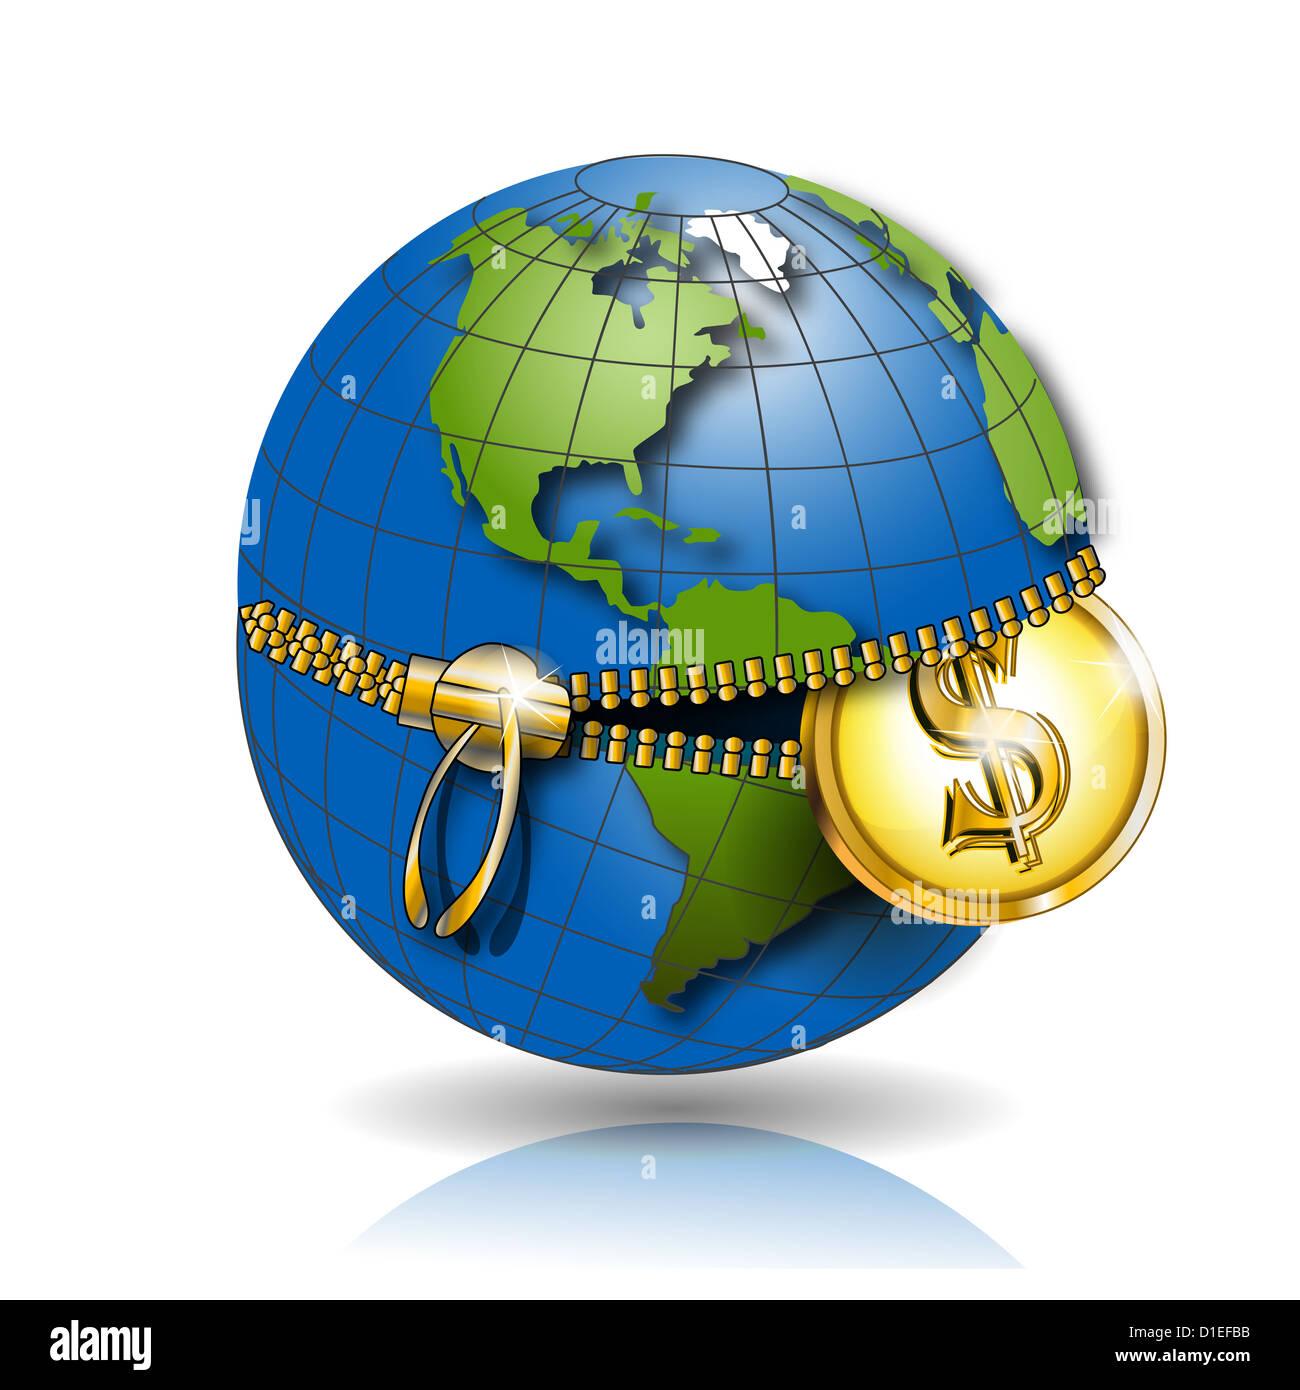 Illustration, Globe Revealled On Equator With Dollar